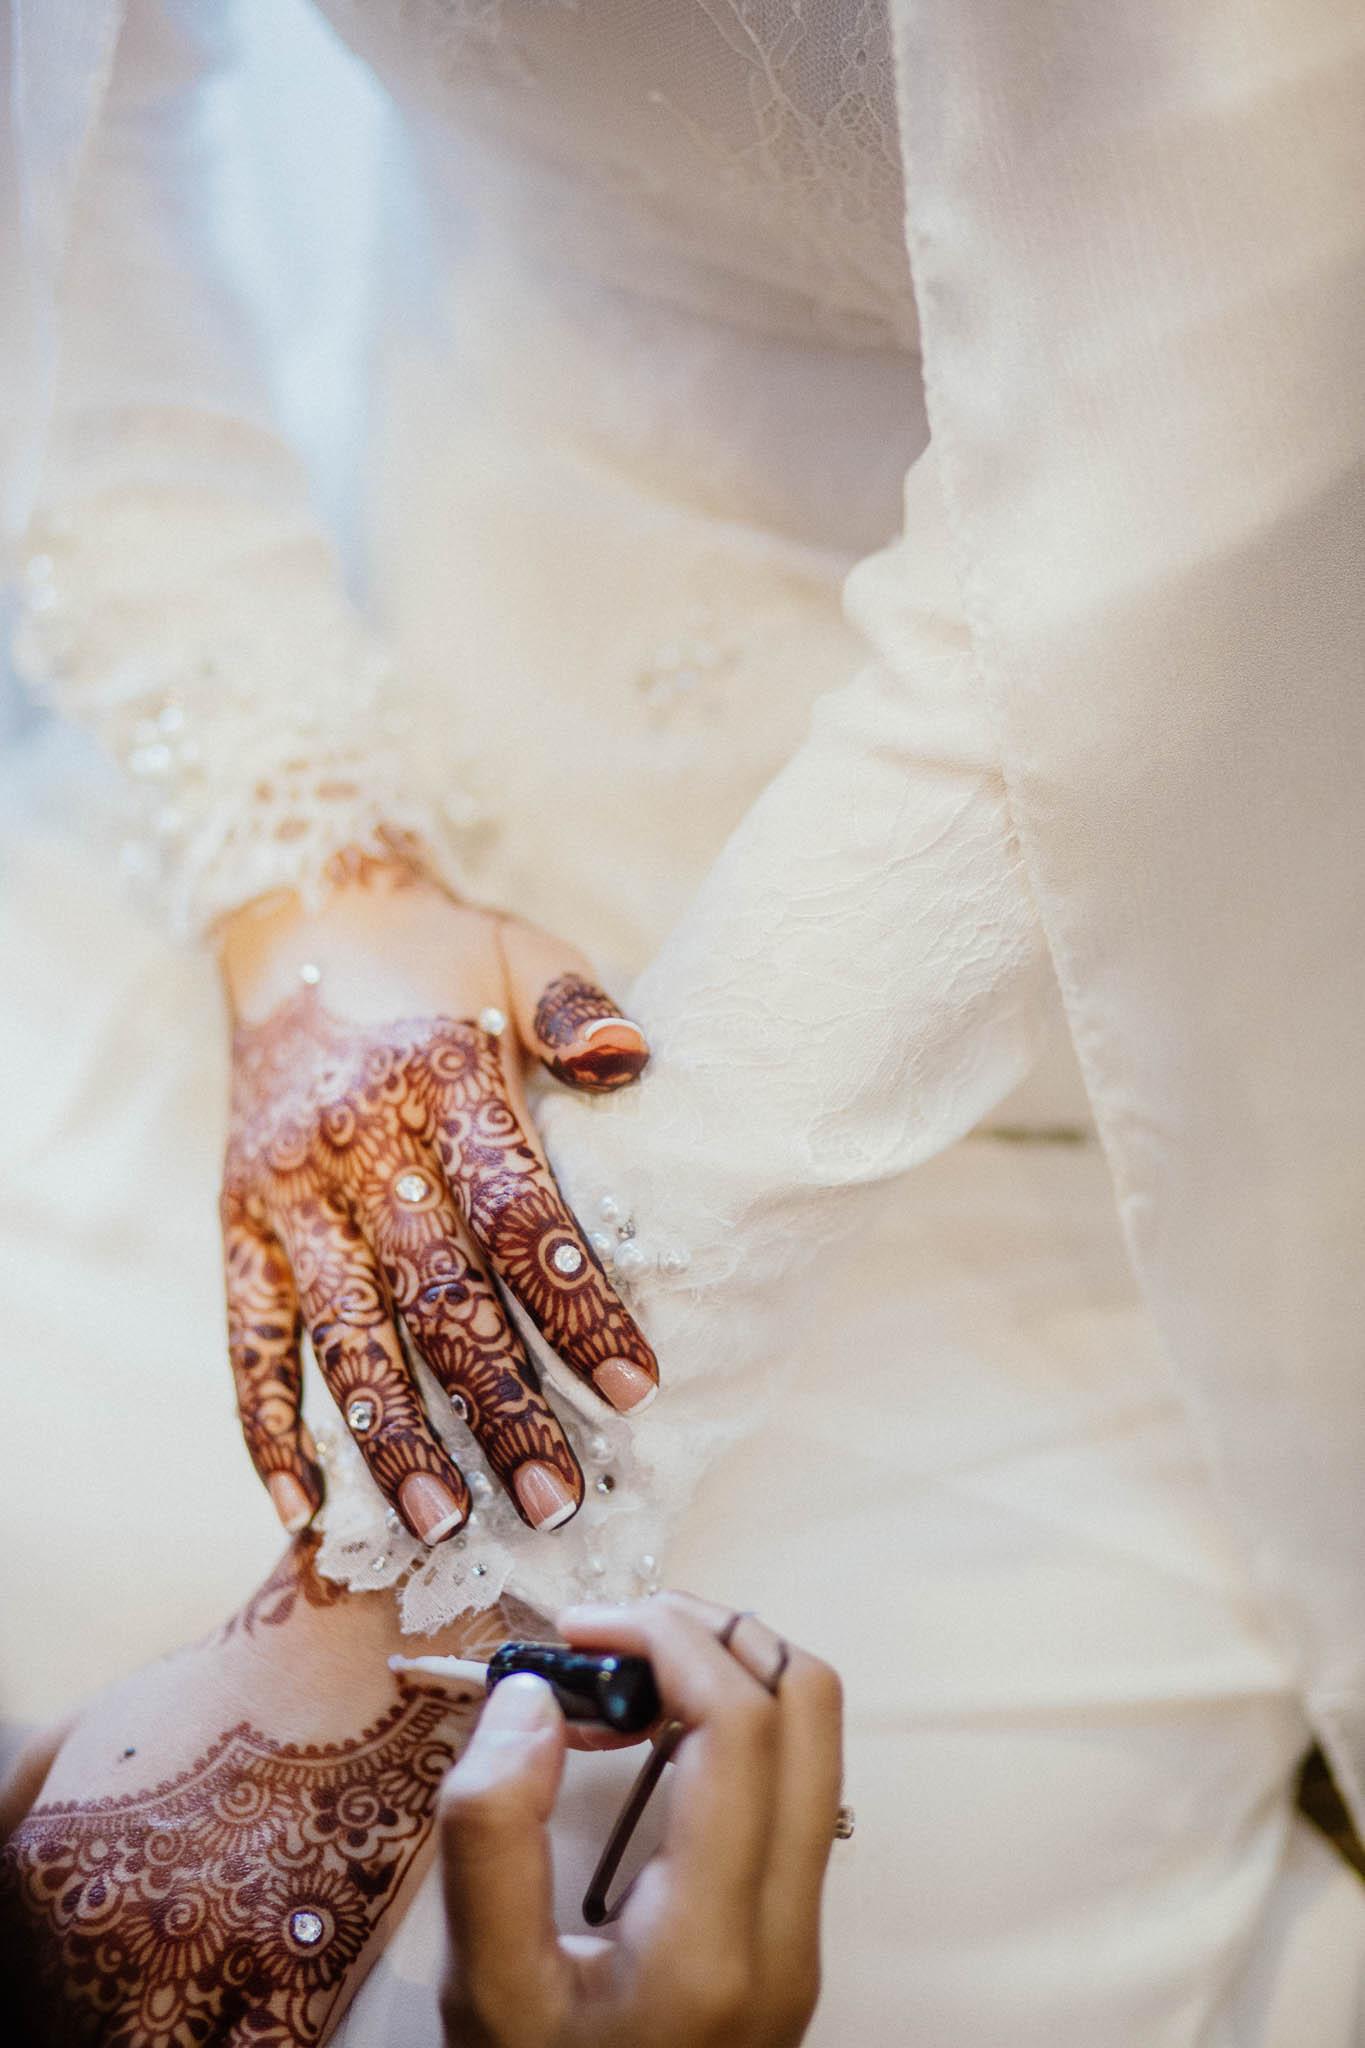 singapore-wedding-photographer-wedding-nufail-addafiq-010.jpg